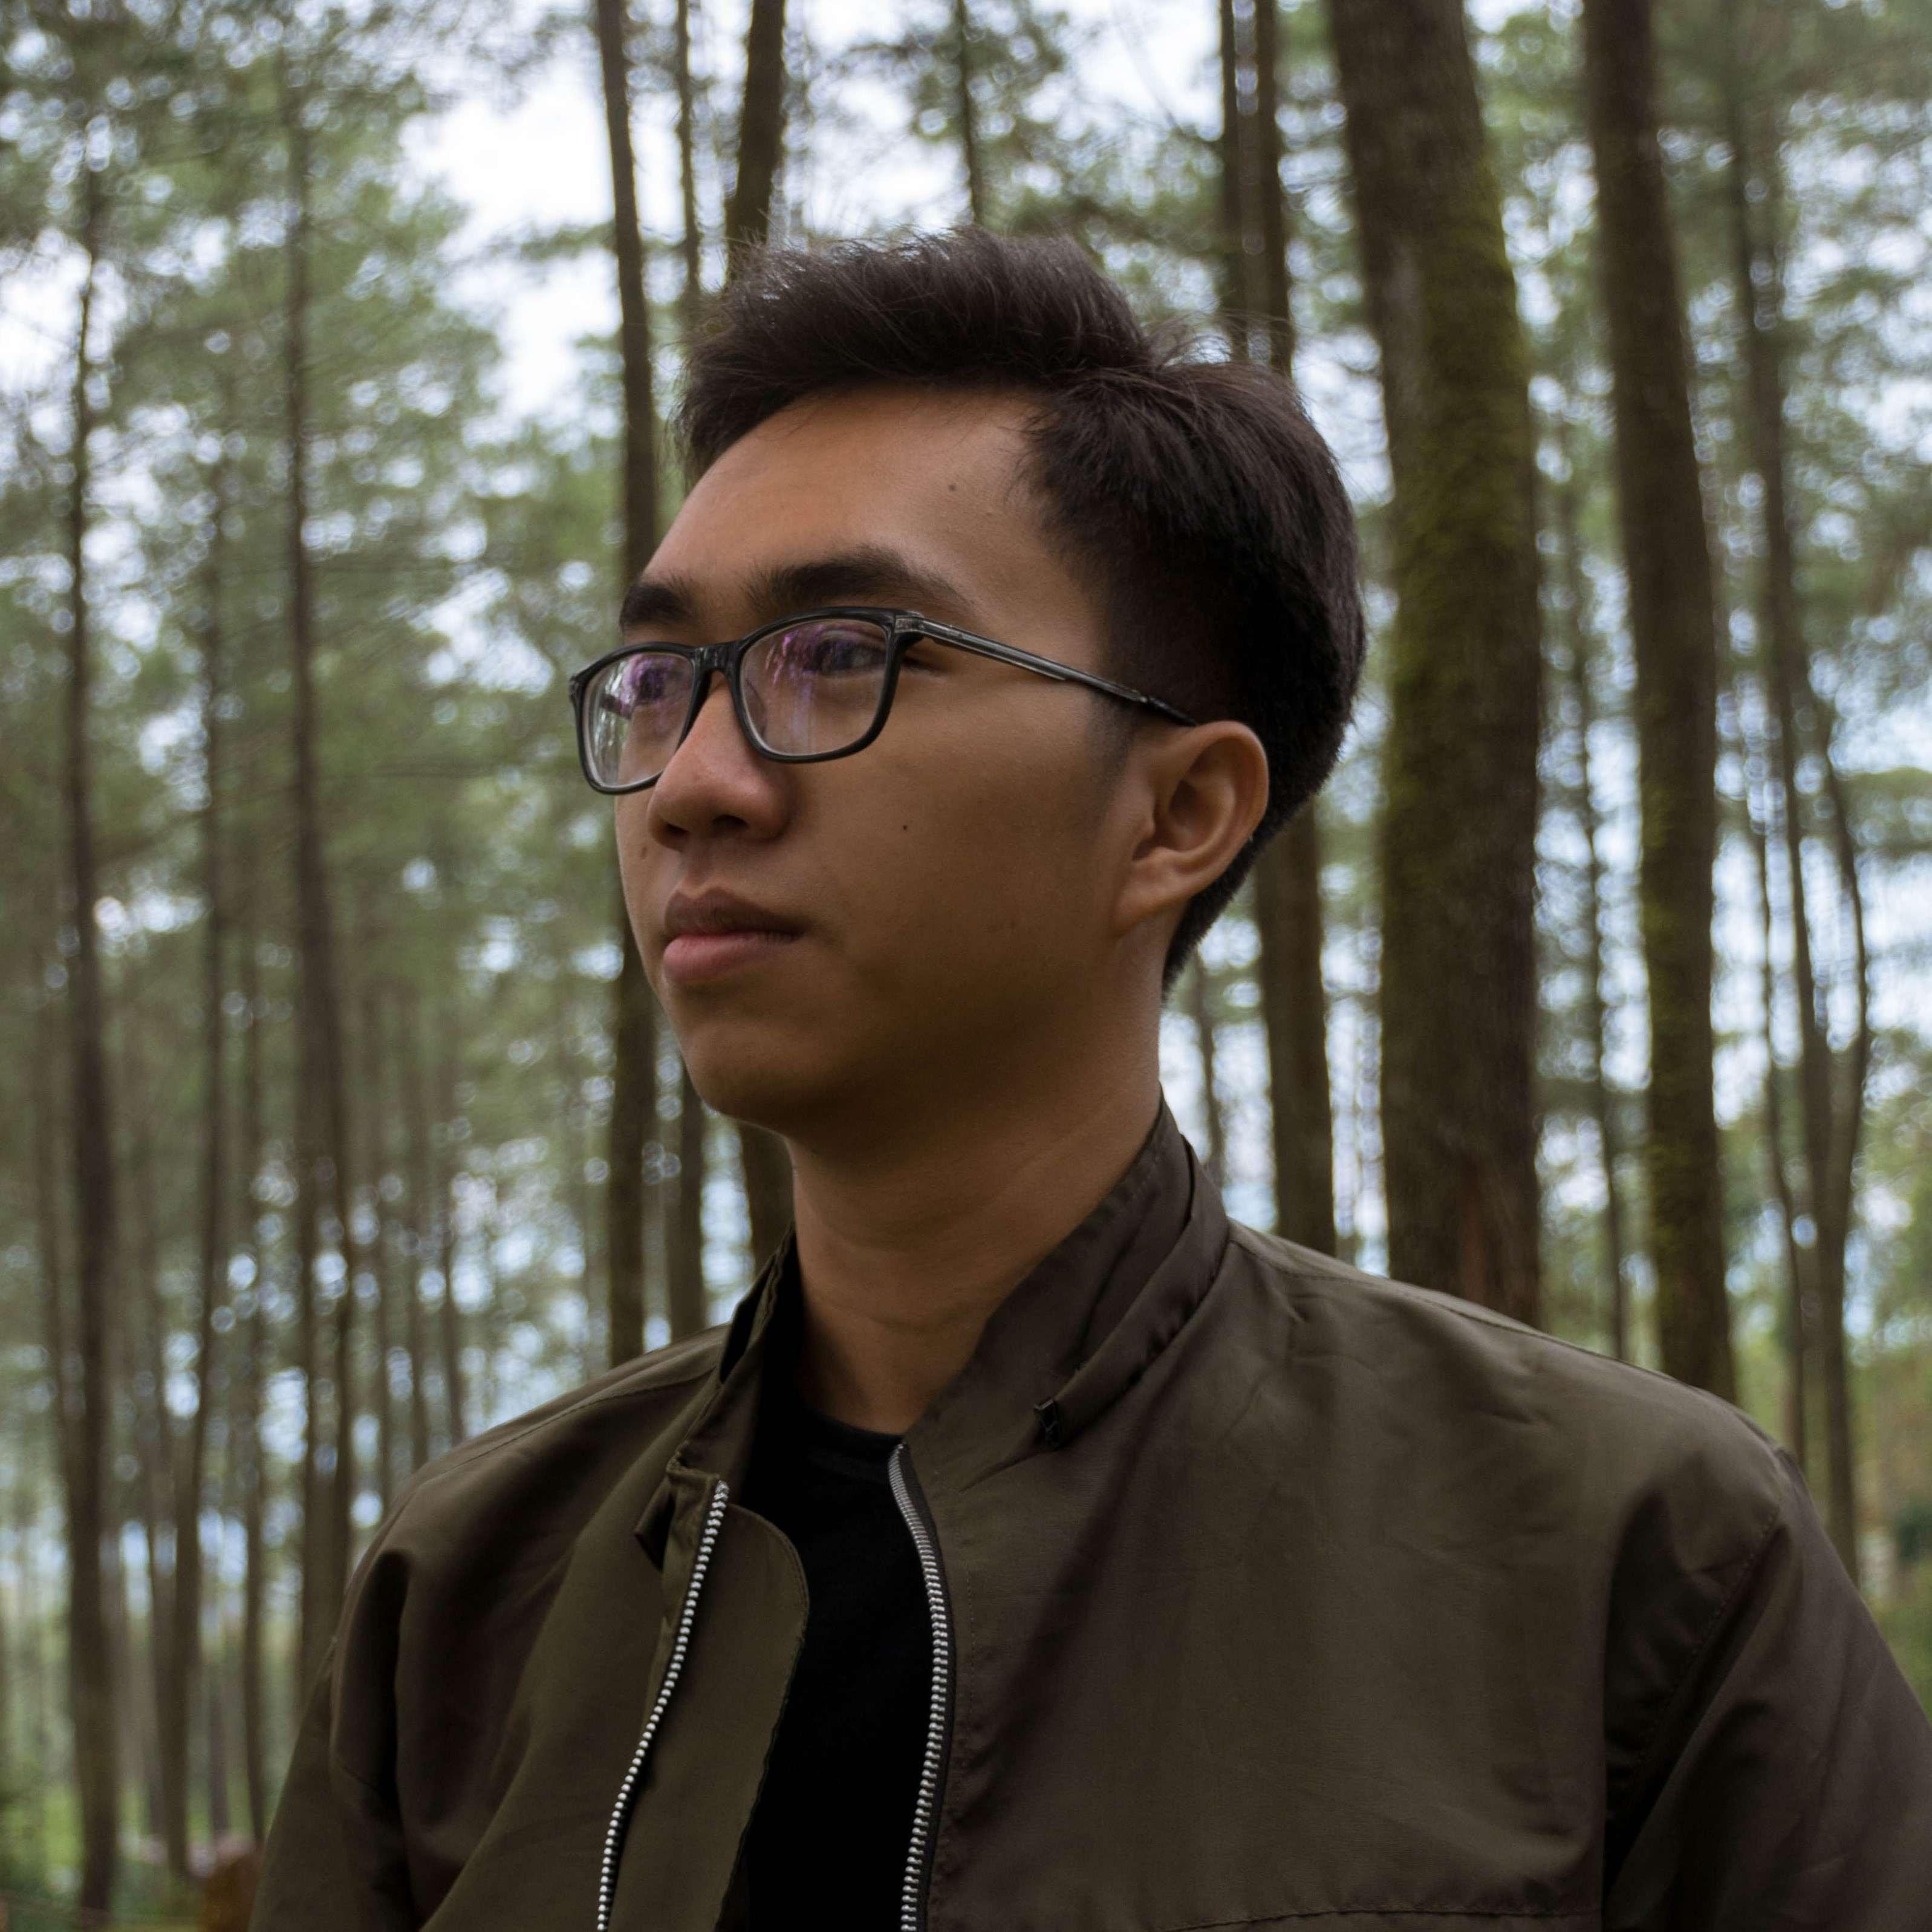 Go to Prawira Adam's profile